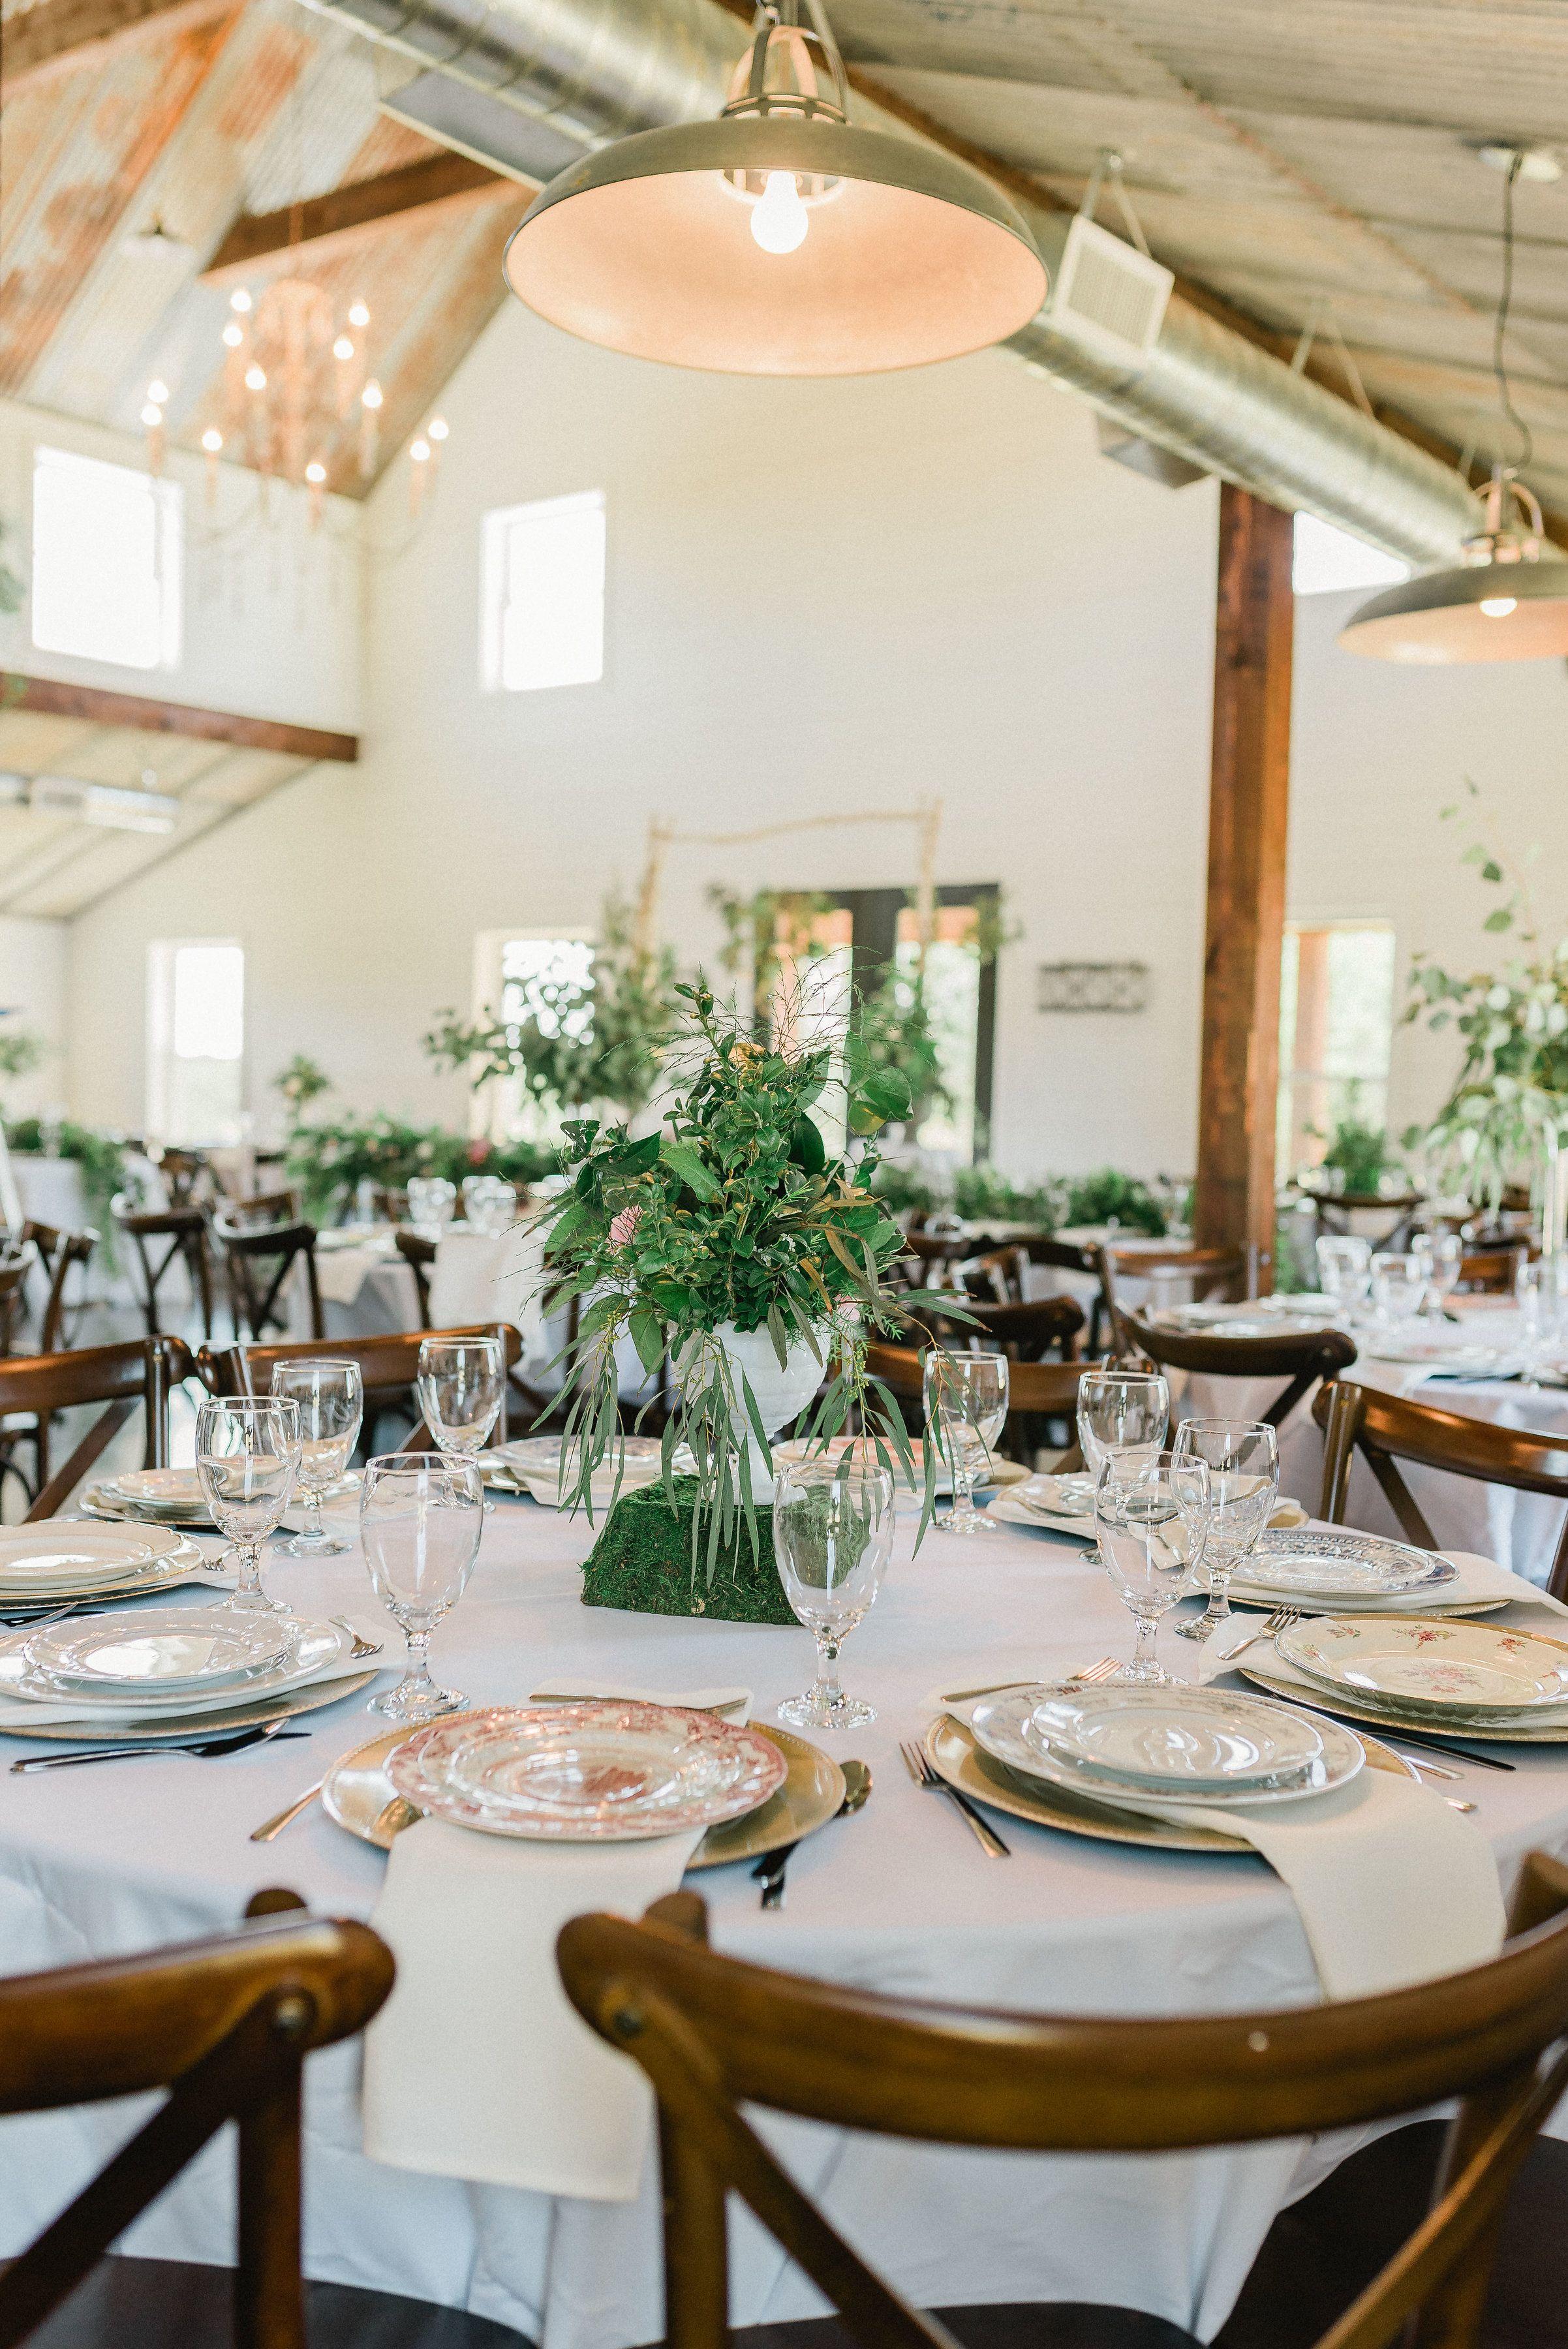 Five Oaks Farm, vintage industrial farmhouse wedding venue